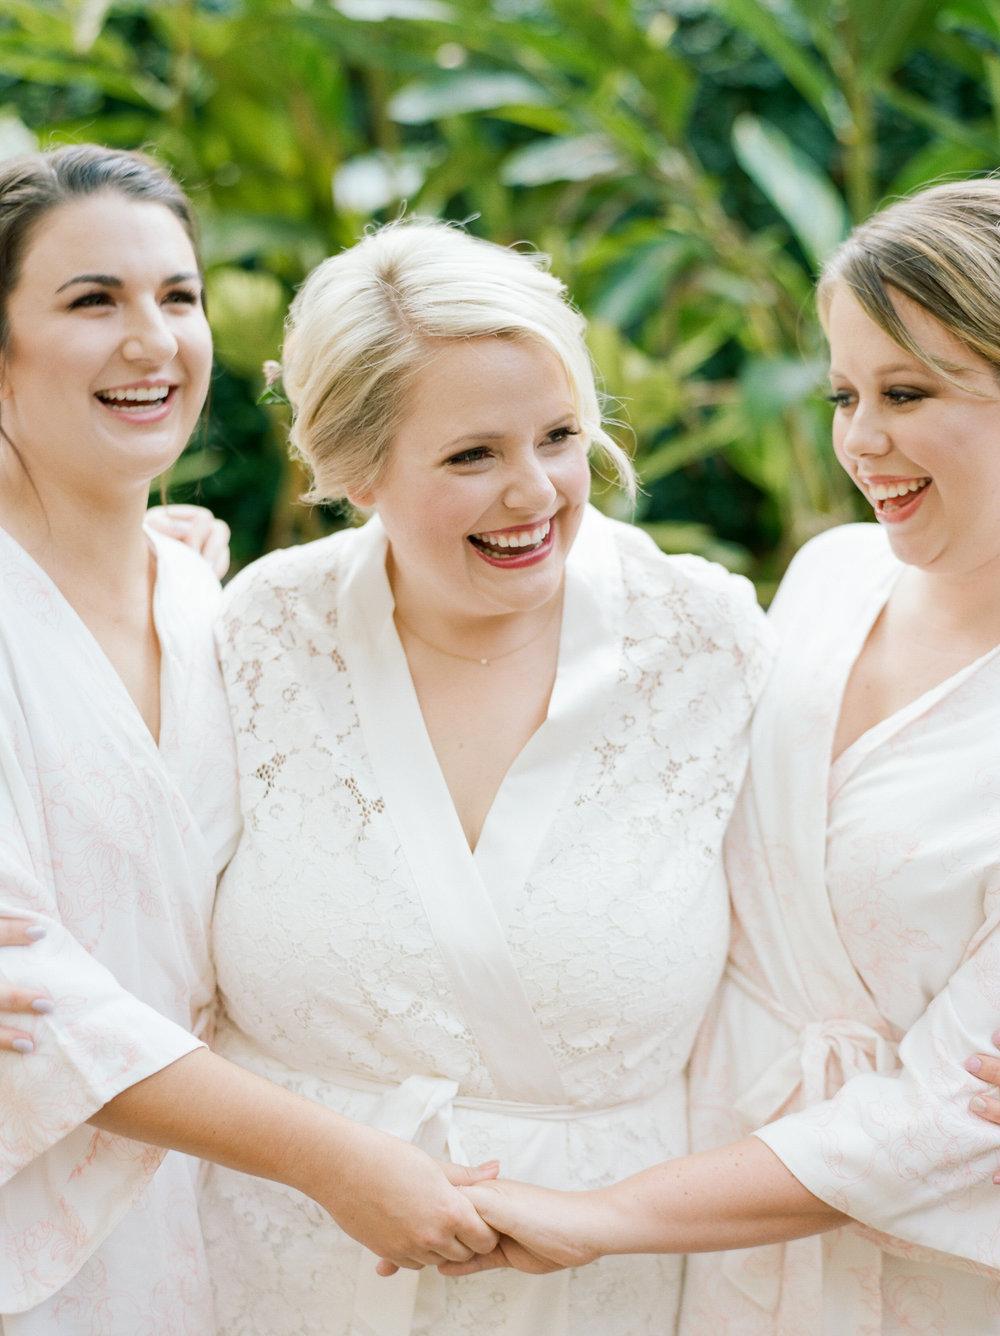 Houston-Wedding-Photographer-Fine-Art-Film-Destination-Style-Me-Pretty-Austin-Dallas-New-Orleans-Dana-Fernandez-Photography-The Woodlands-Country-Club-16.jpg